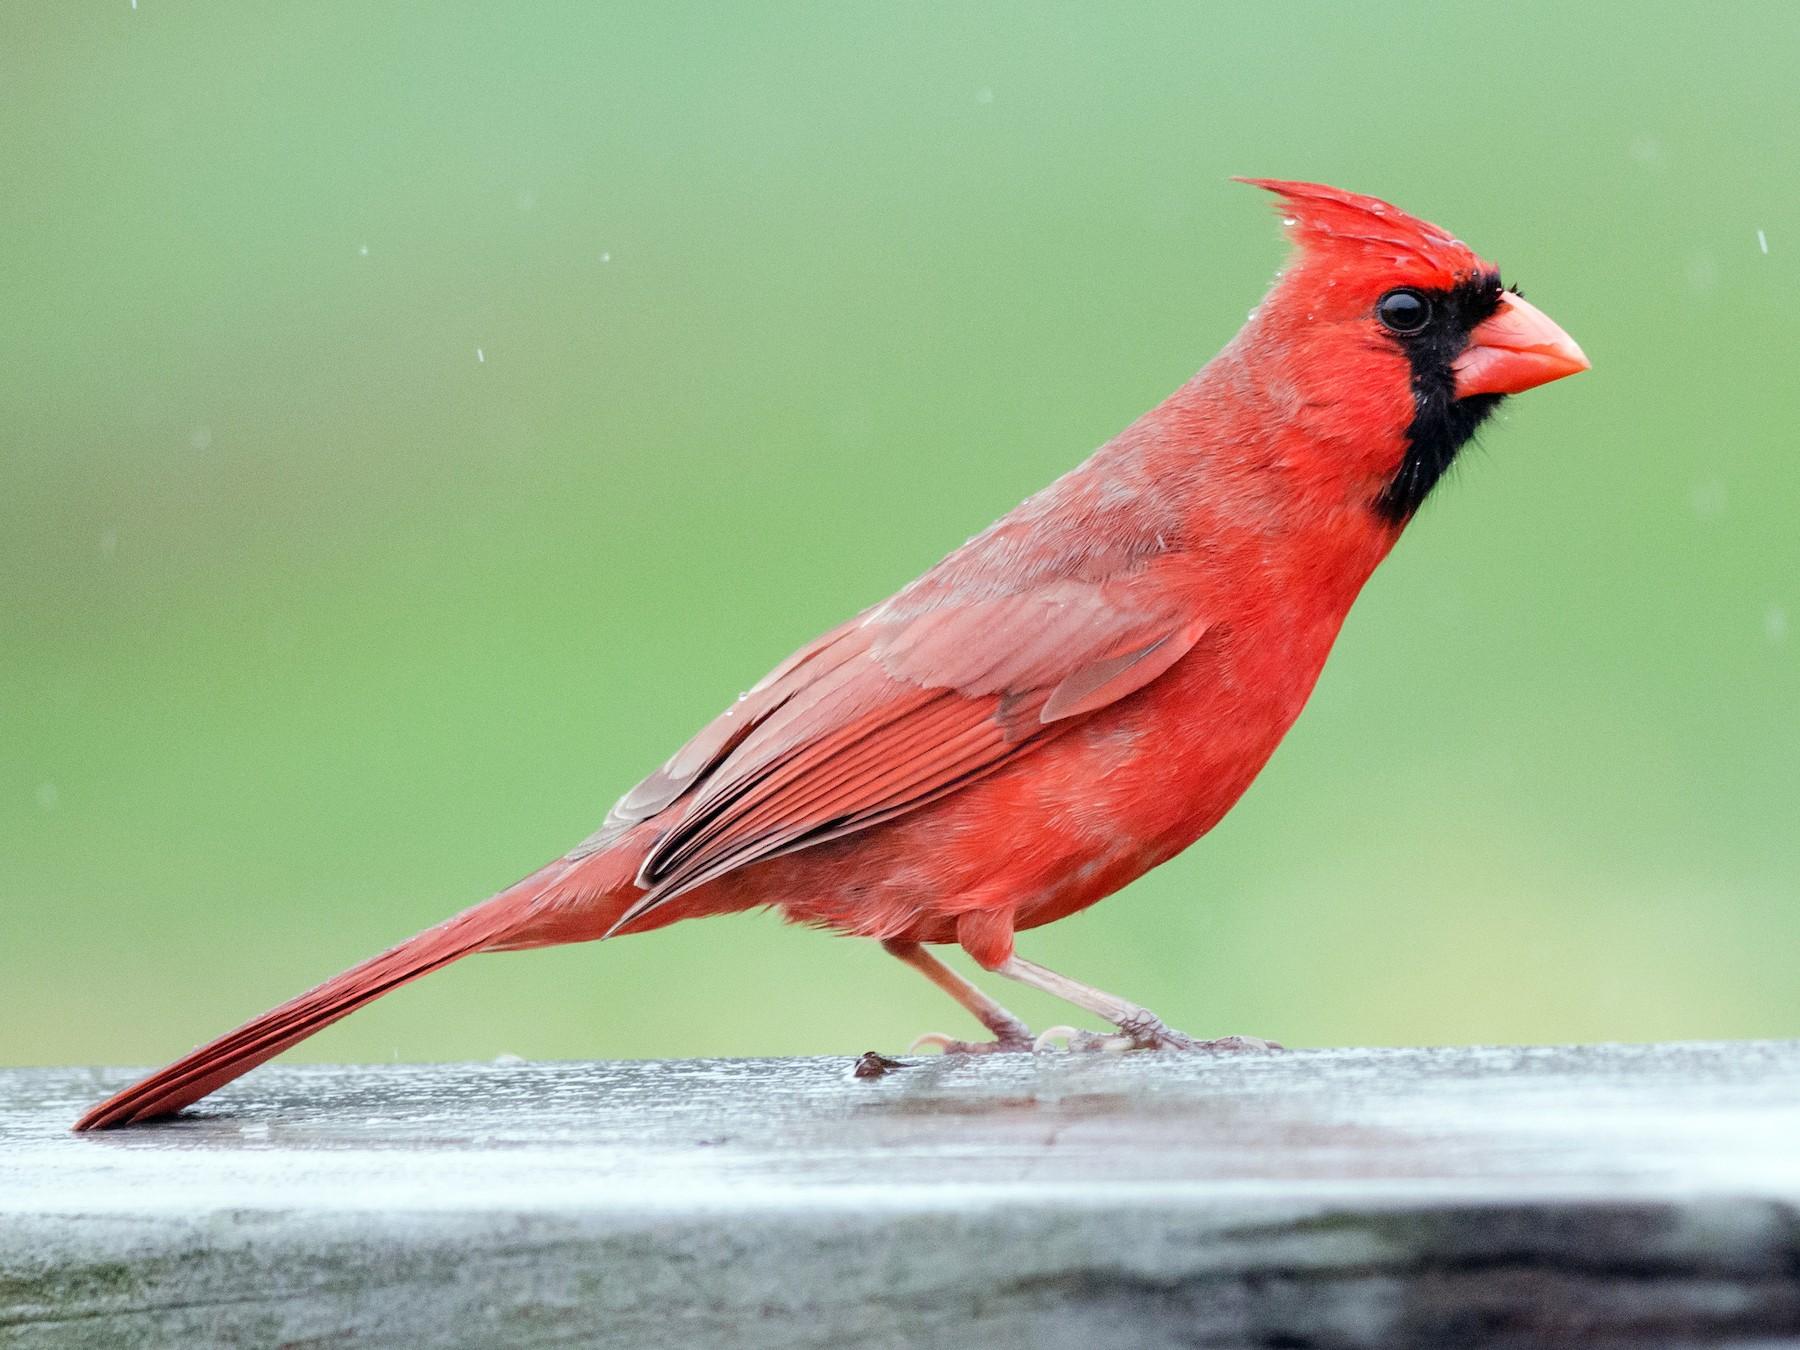 Northern Cardinal - Alix d'Entremont